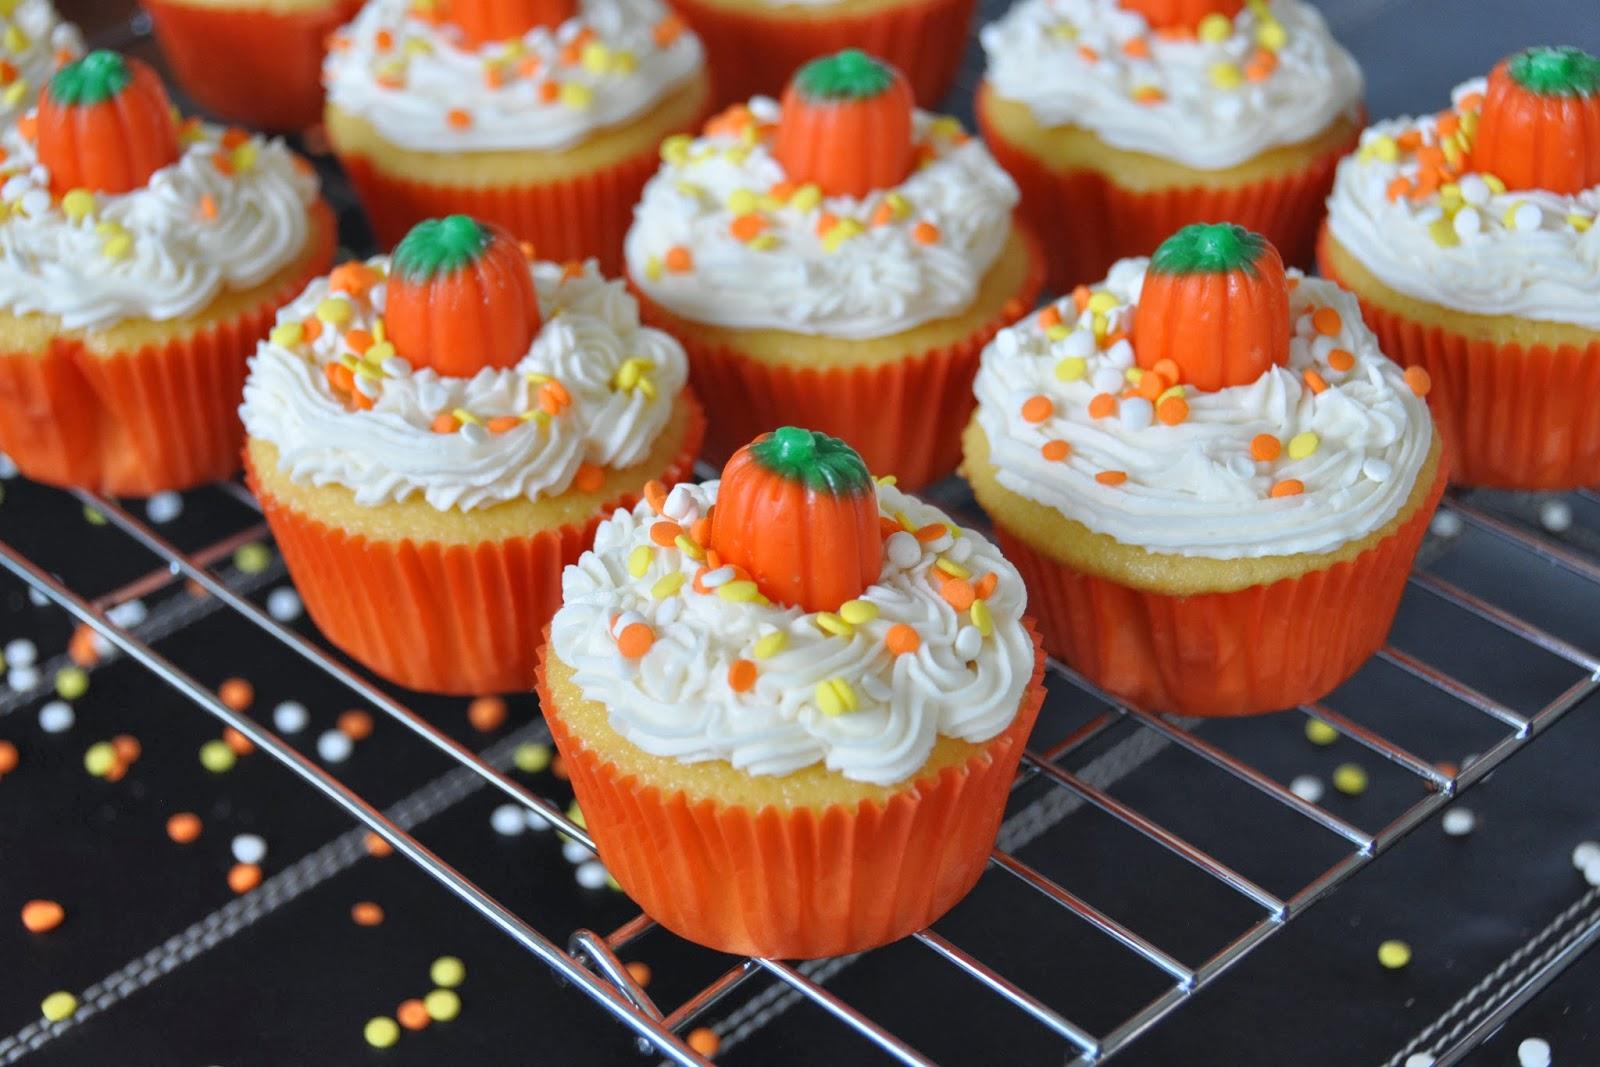 Hd wallpapers blog halloween pumpkin cupcakes - Halloween decorations for cupcakes ...